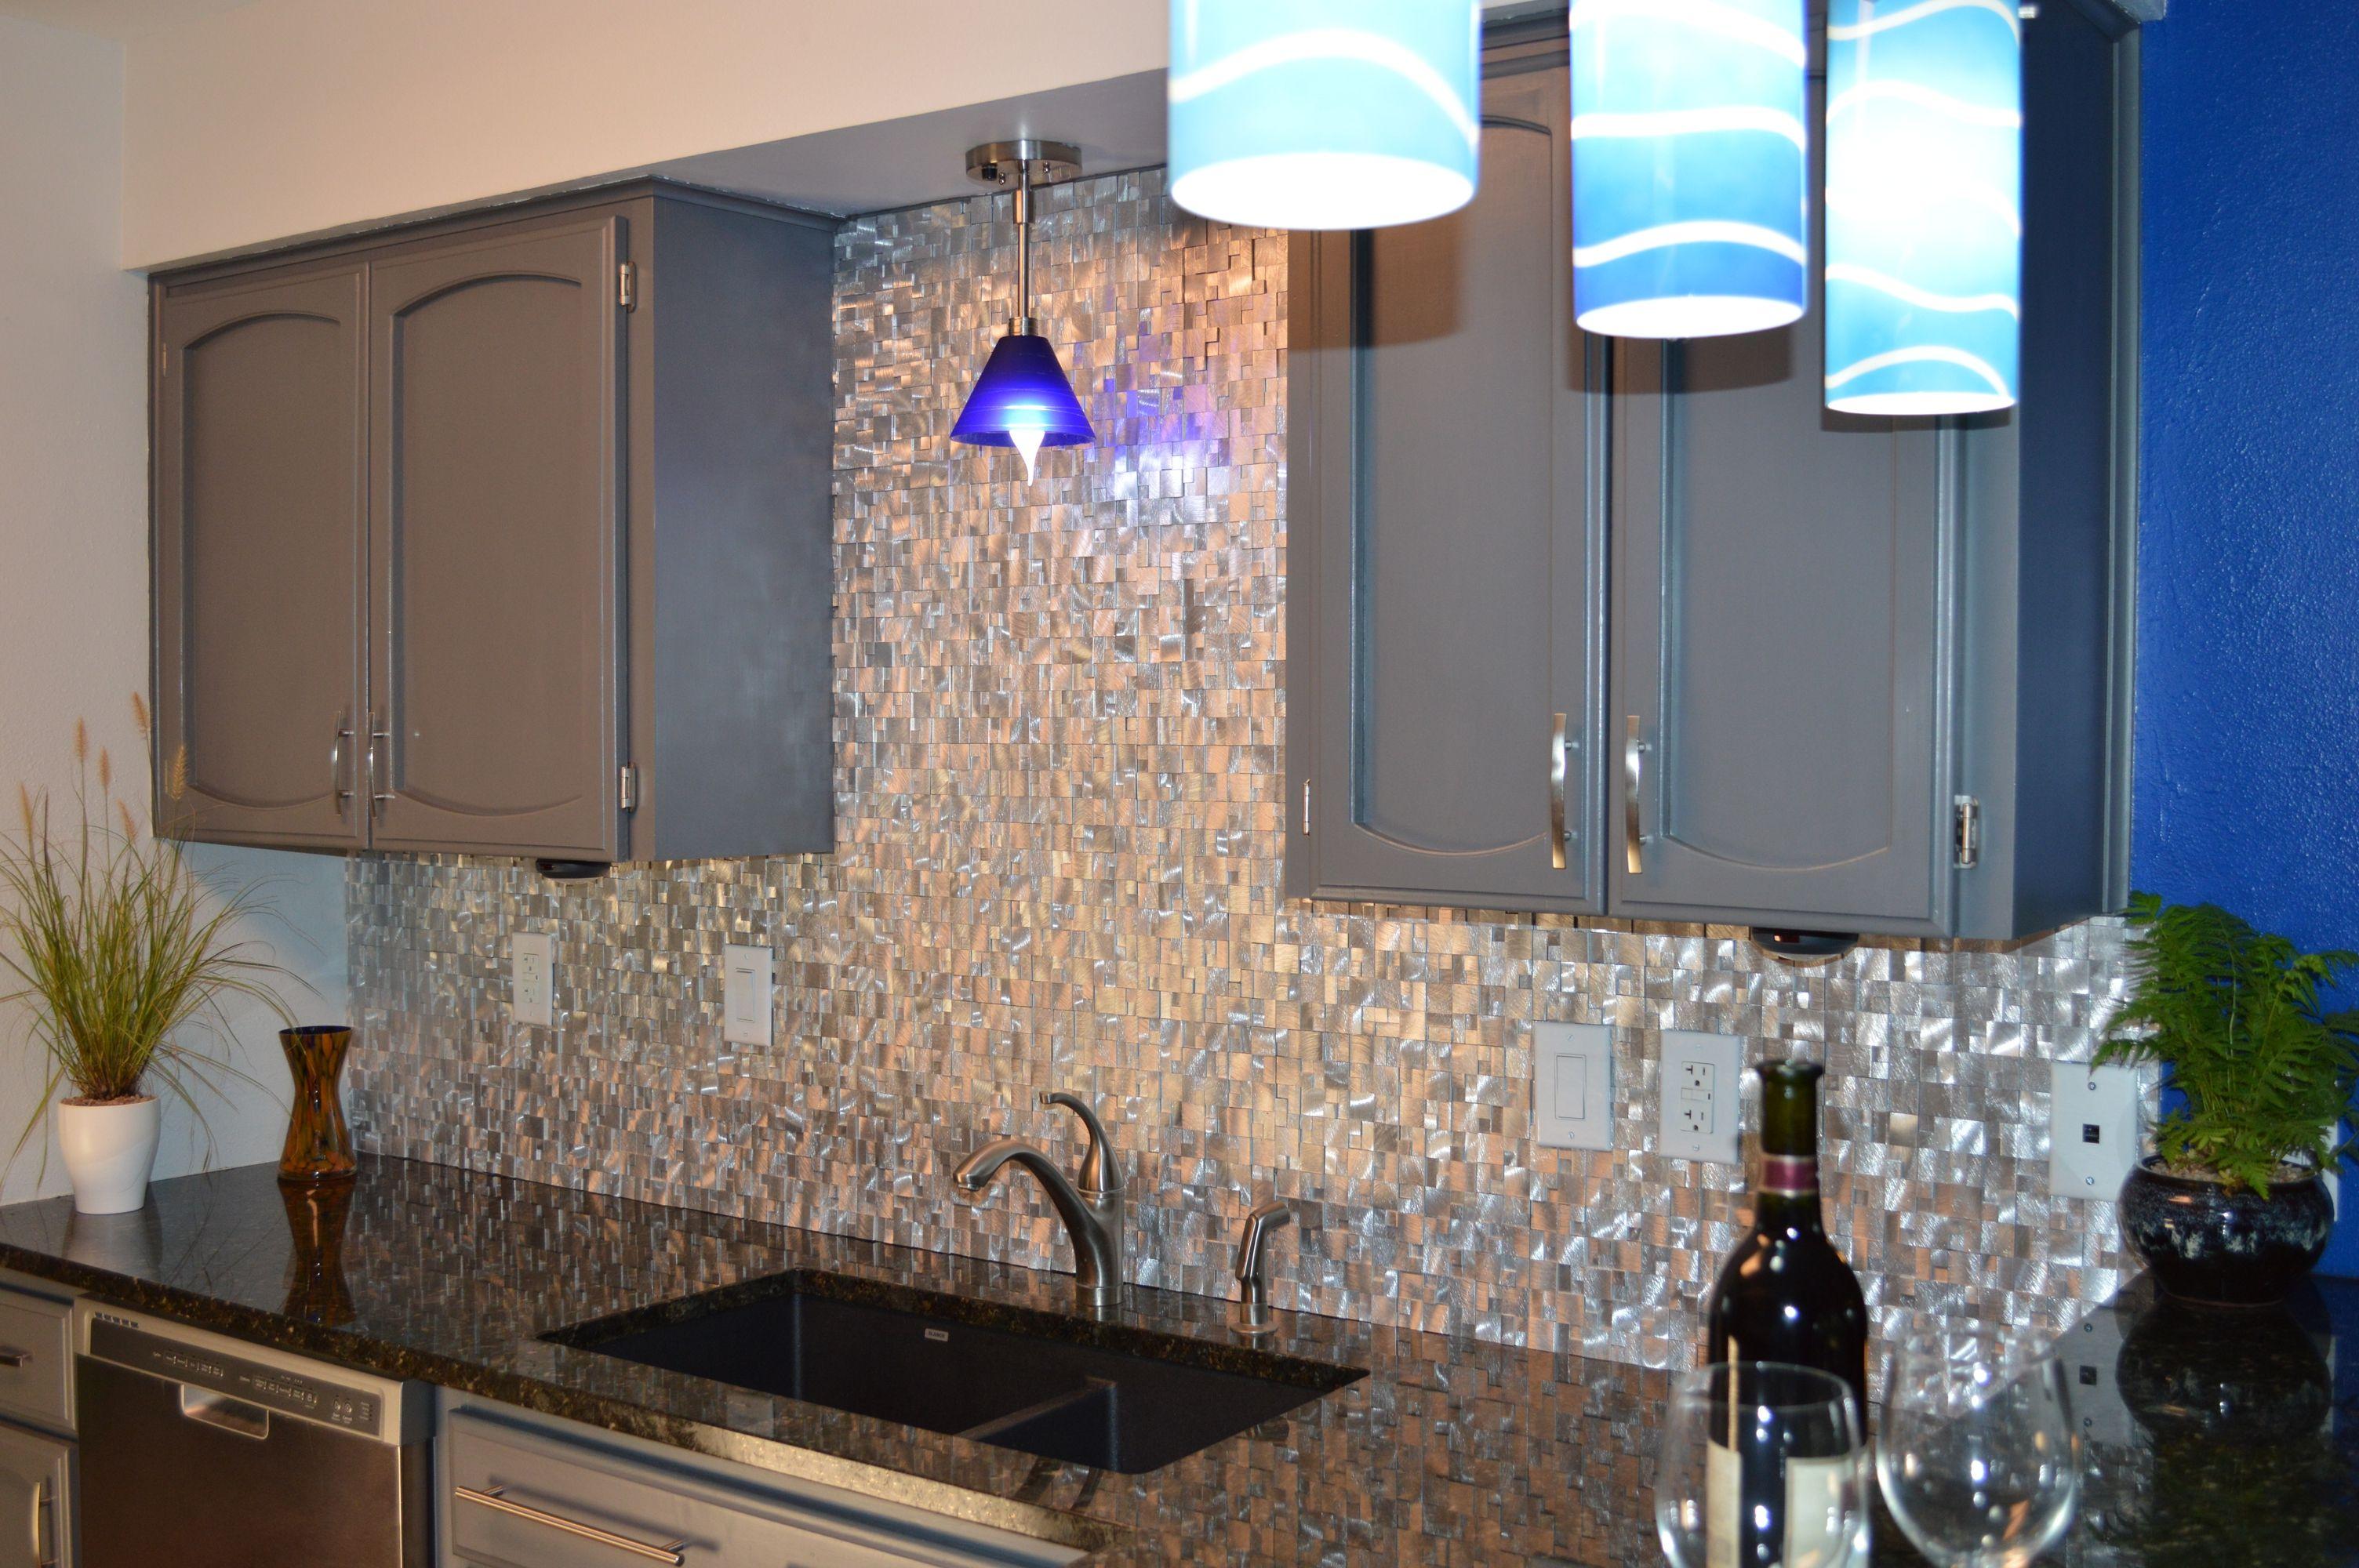 Cobblestone Backsplash 3d raised cobblestone pattern aluminum mosaic tile - emt_al10-sil